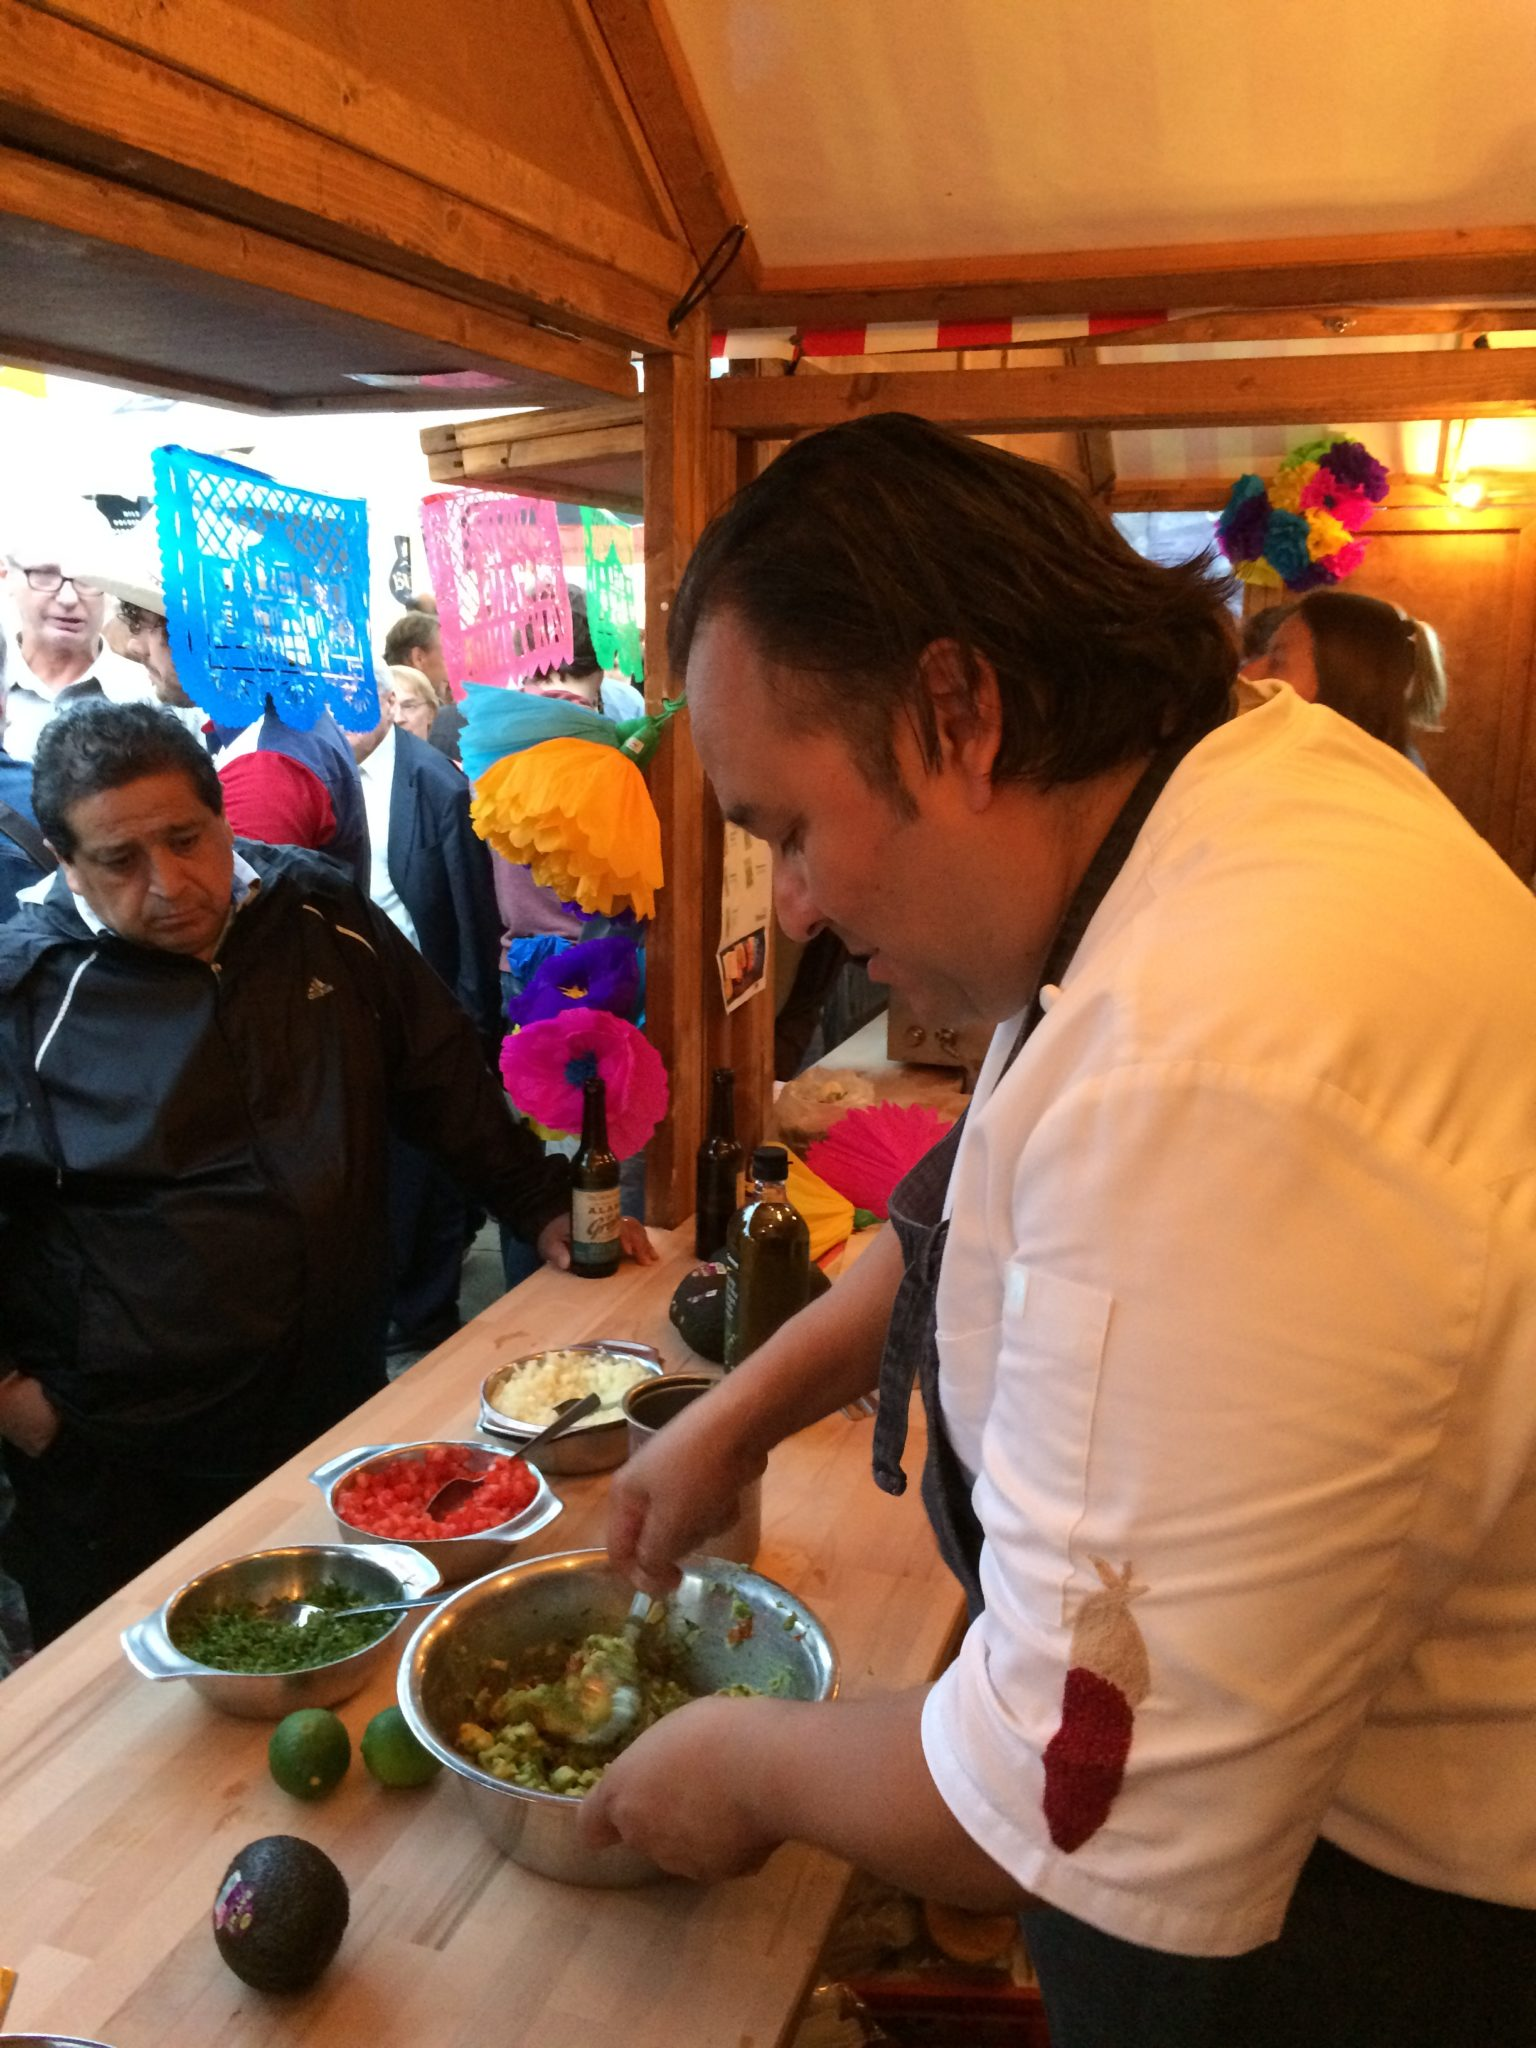 Chef Johnny Hernandez prepares guacamole at Darmstadt's Heinerfest in the summer of 2017.